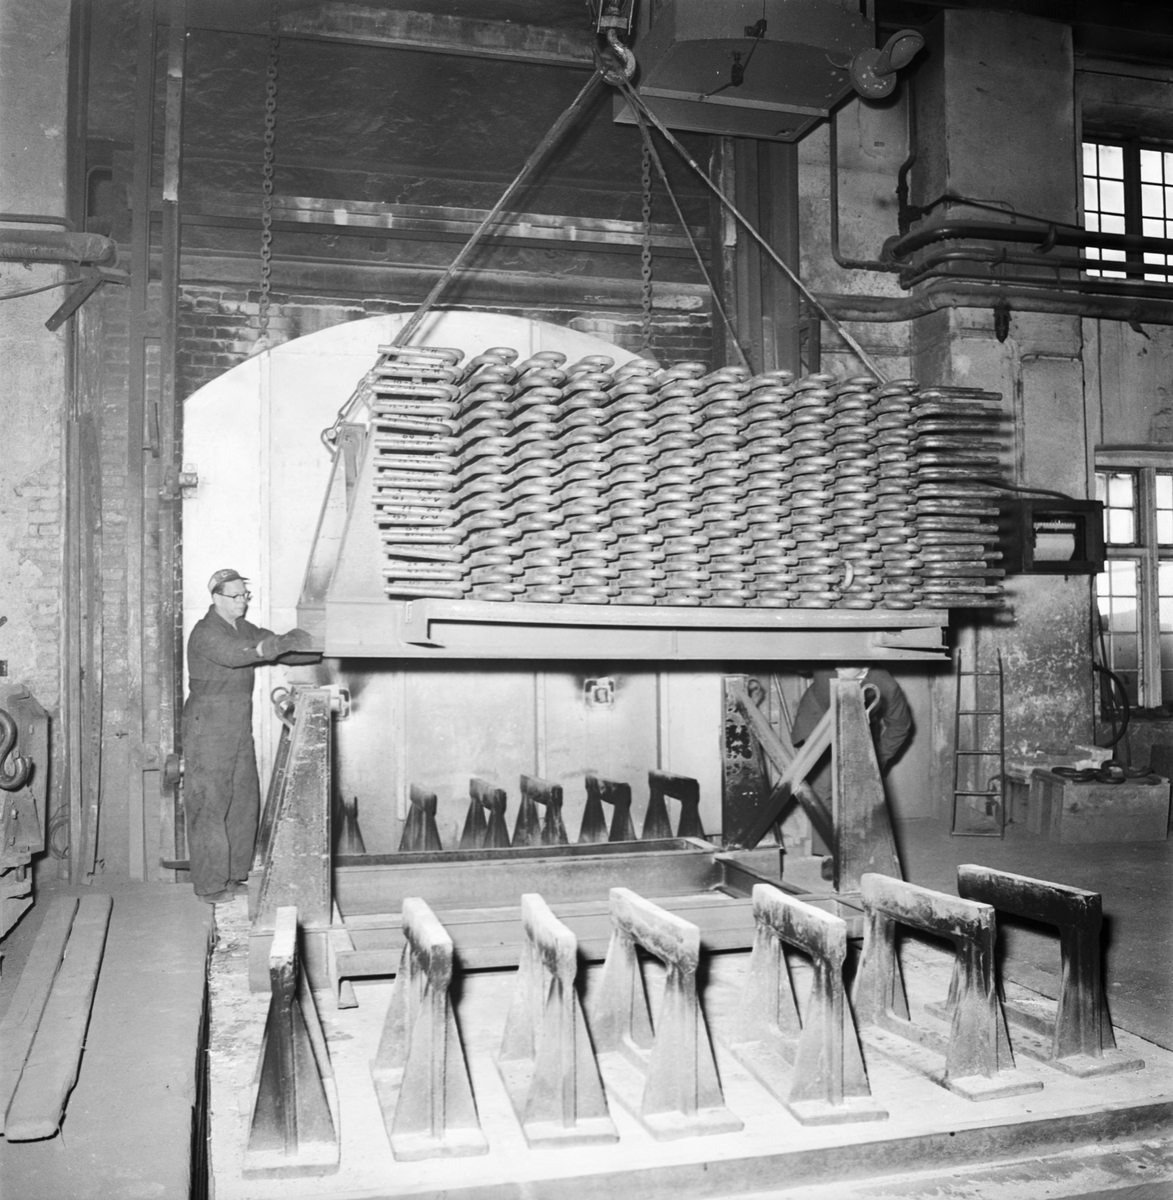 Övrigt: Foto datum: 8/10 1963 Verkstäder och personal. Götaverken pannor i g:a bleckslageriverkstan